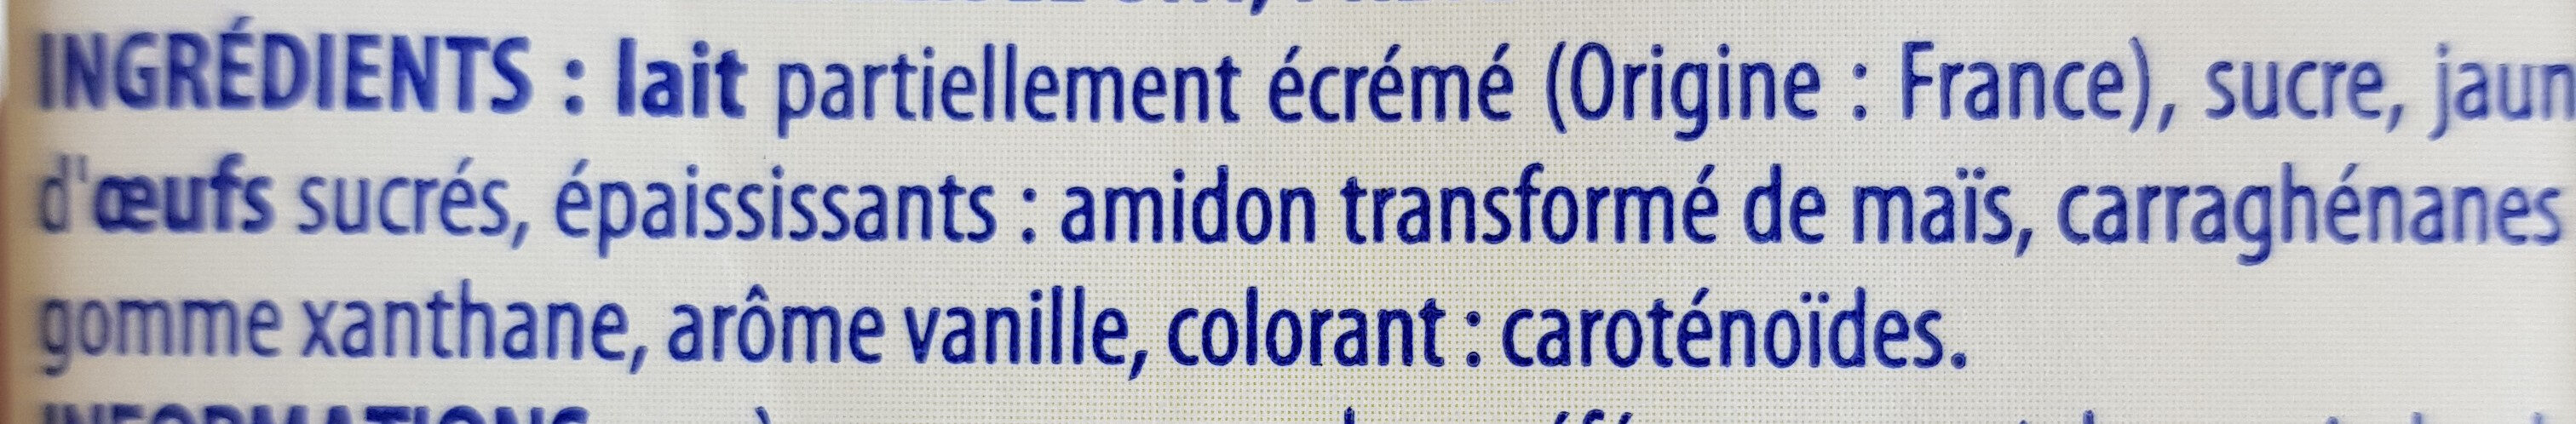 Crème Anglaise prête à l'emploi - Ingredienti - fr